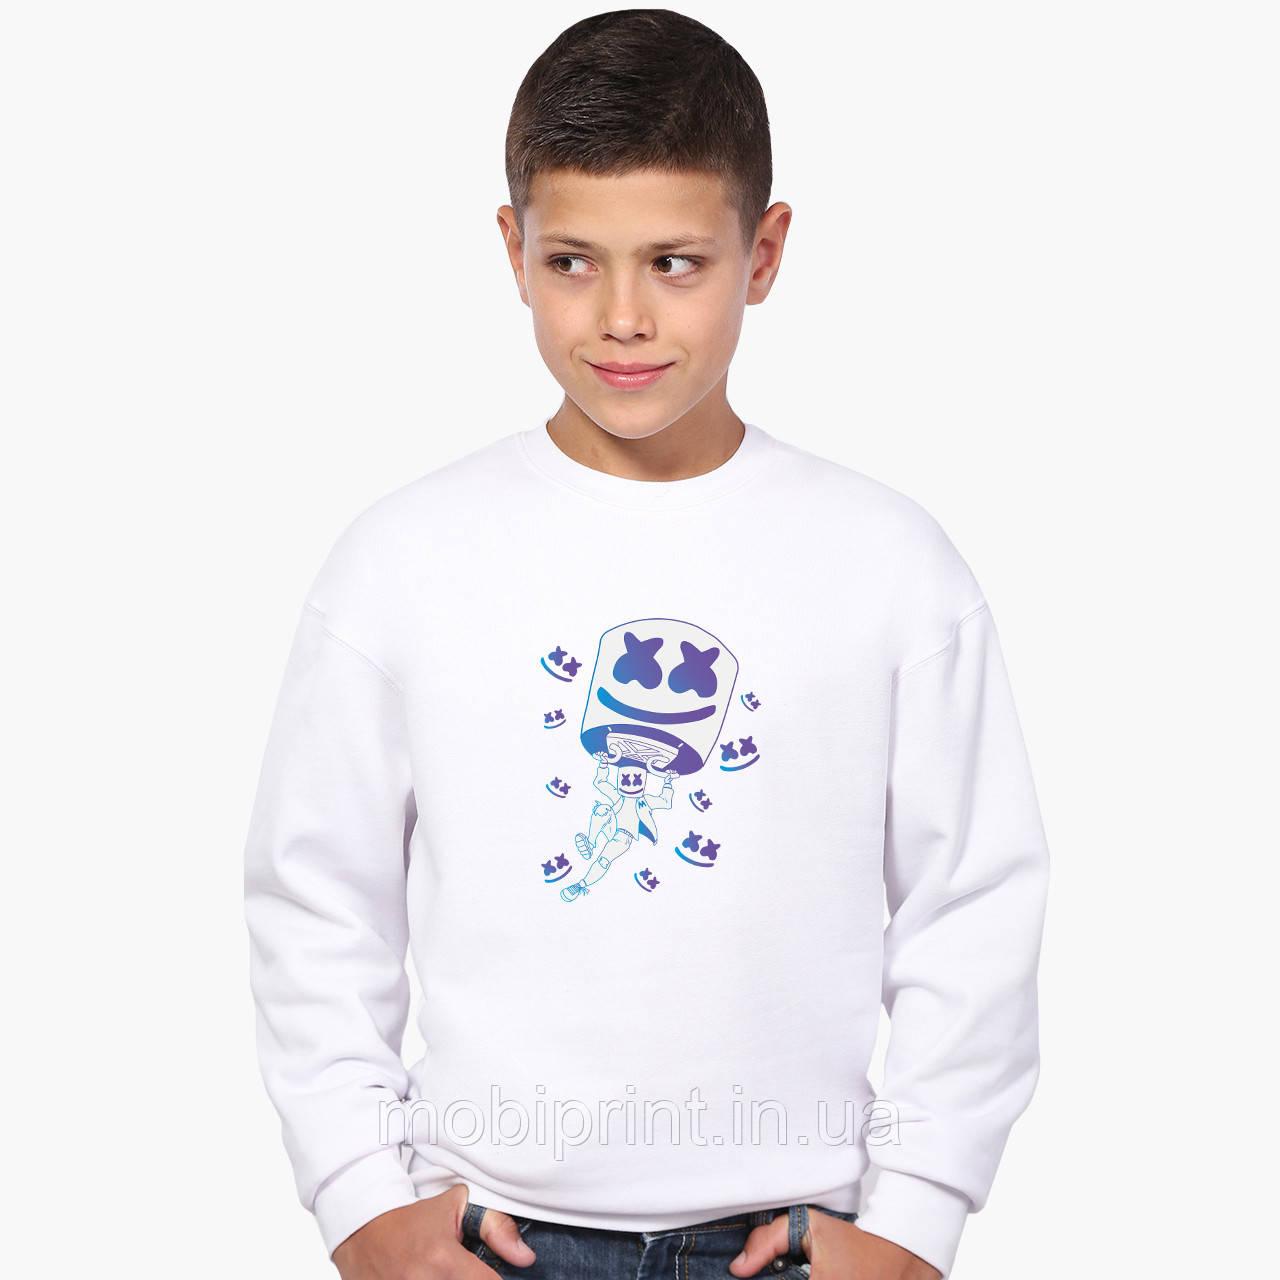 Свитшот для мальчика Маршмелло Фортнайт (Marshmello Fortnite) (9509-1329-8) Белый